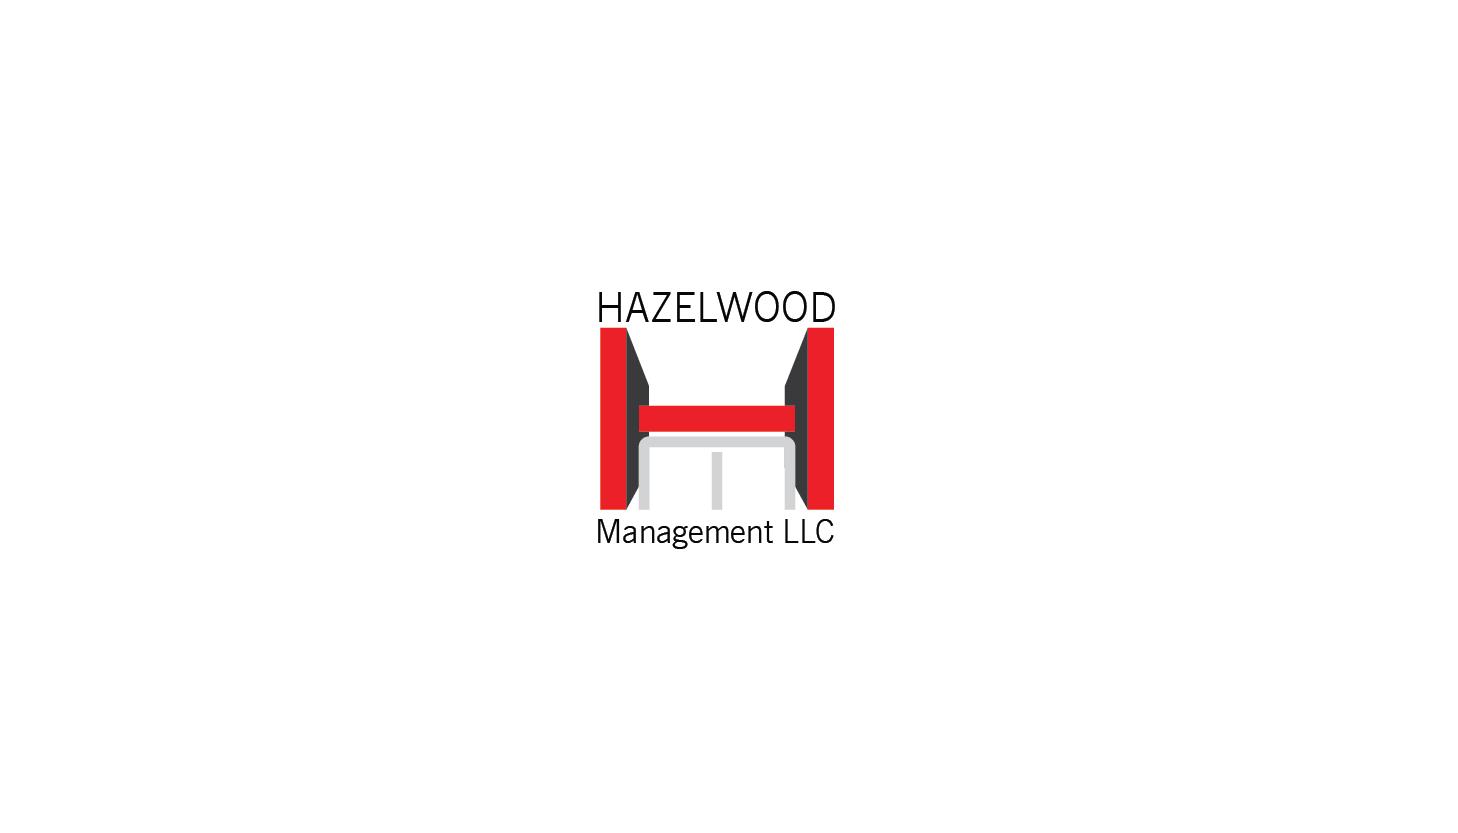 Logo Design by Private User - Entry No. 132 in the Logo Design Contest Hazelwood Management LLC Logo Design.